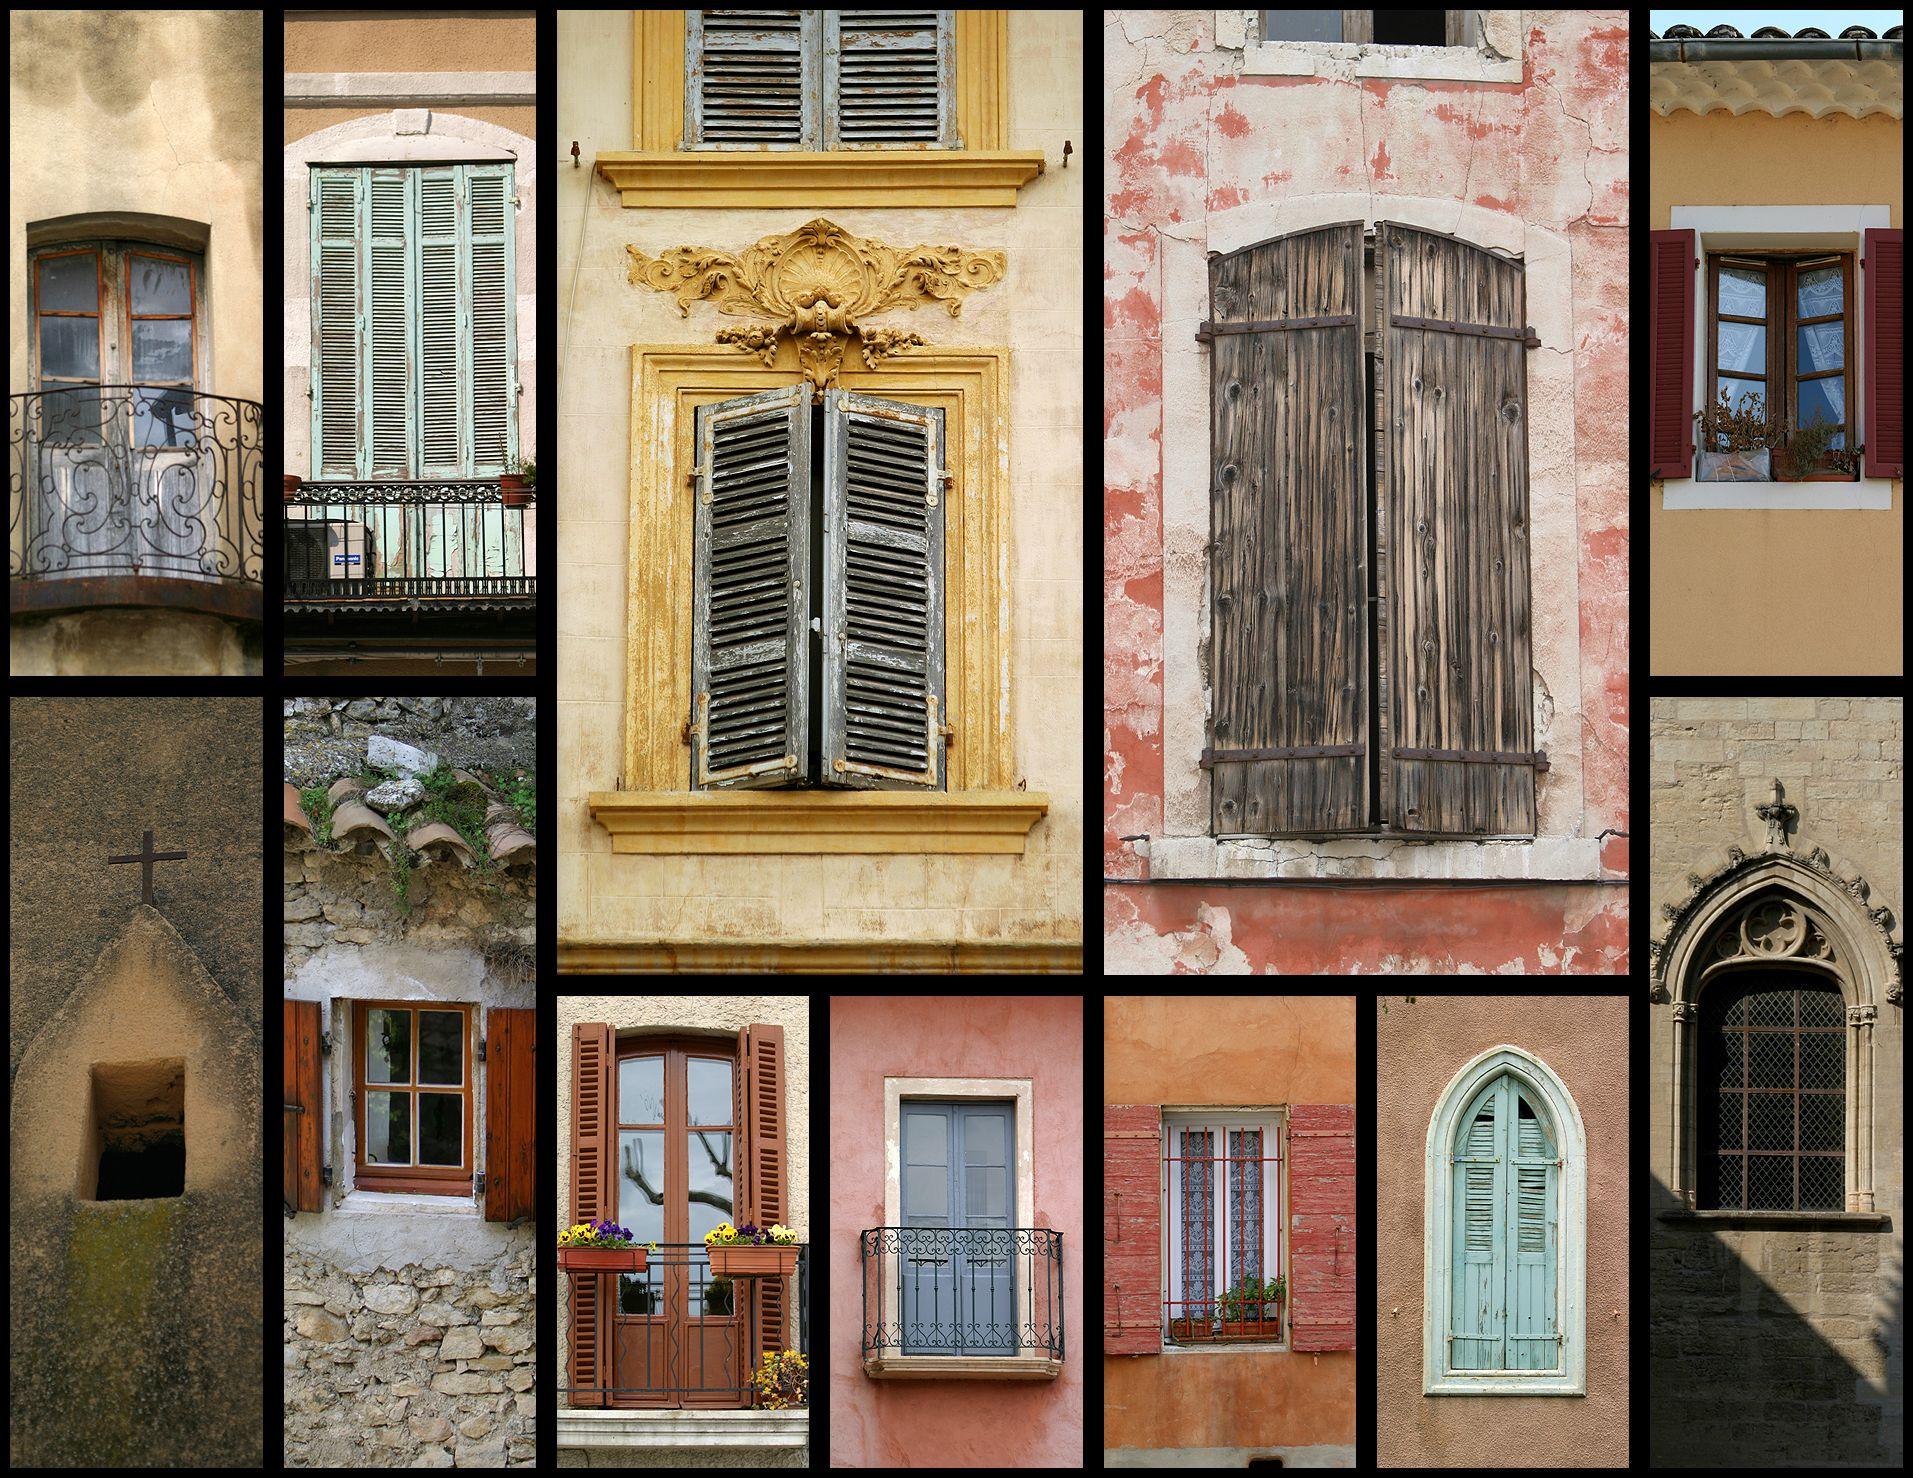 Provence doors